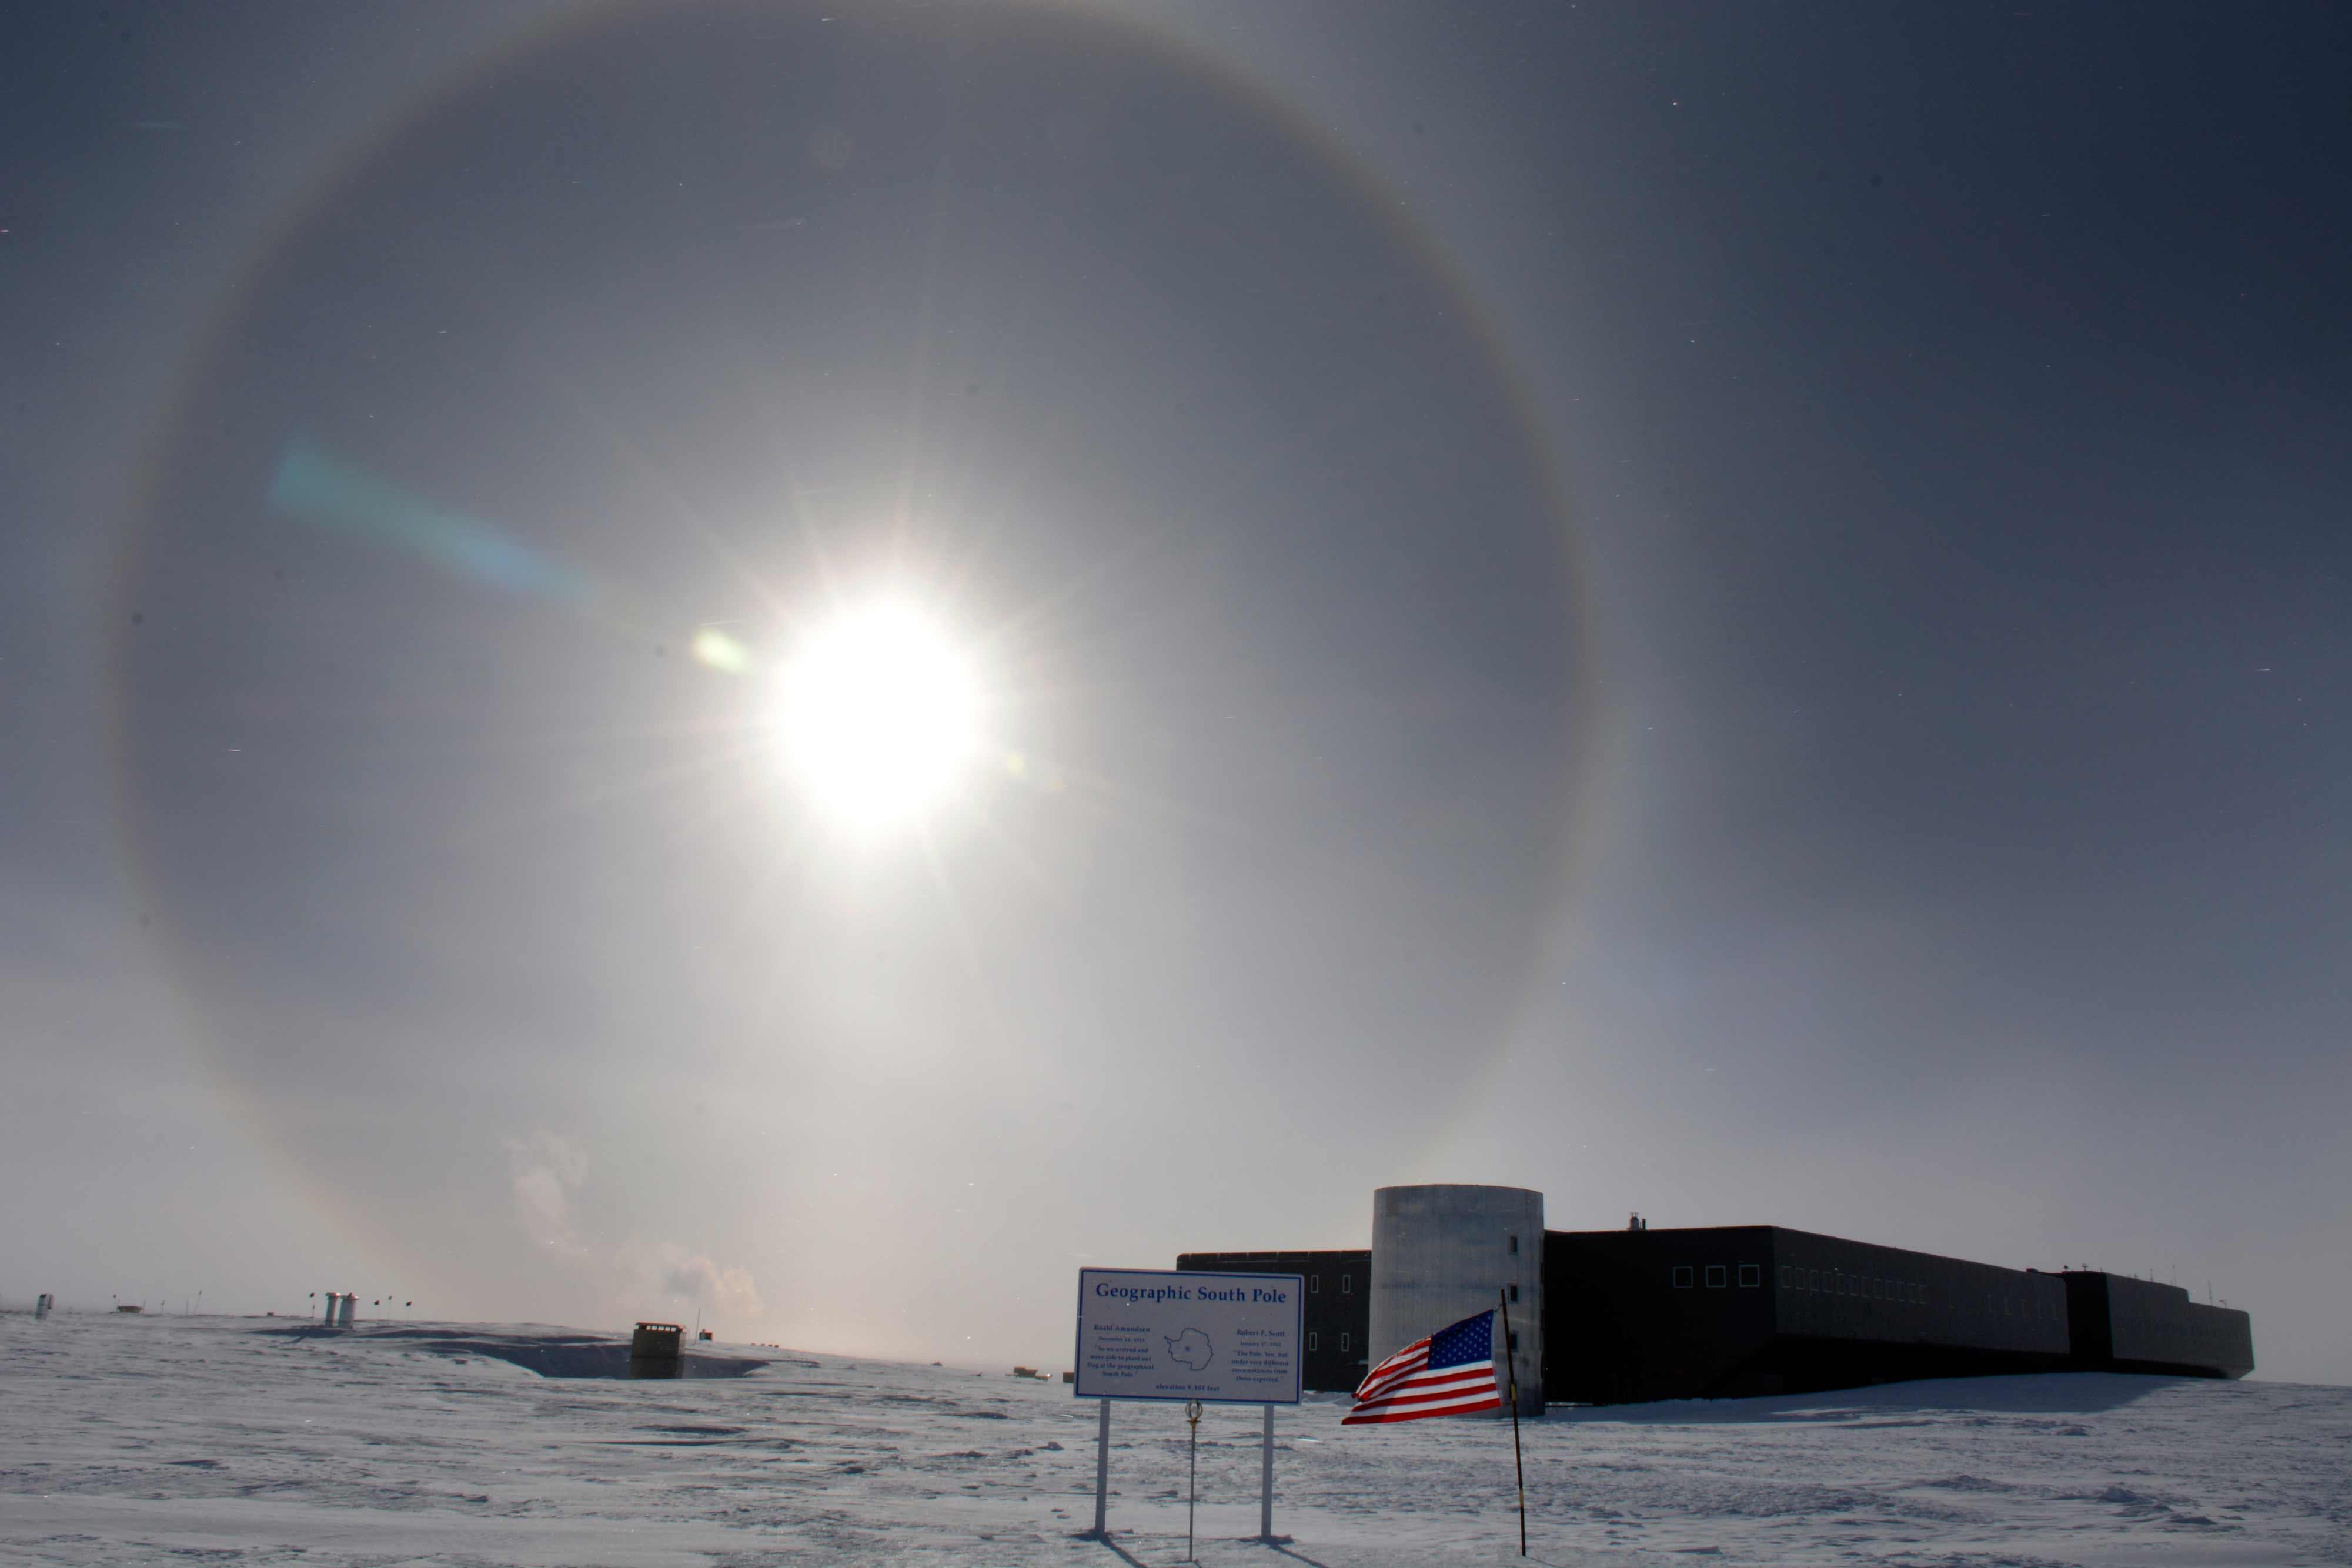 Antarctic station at the South Pole Amundsen